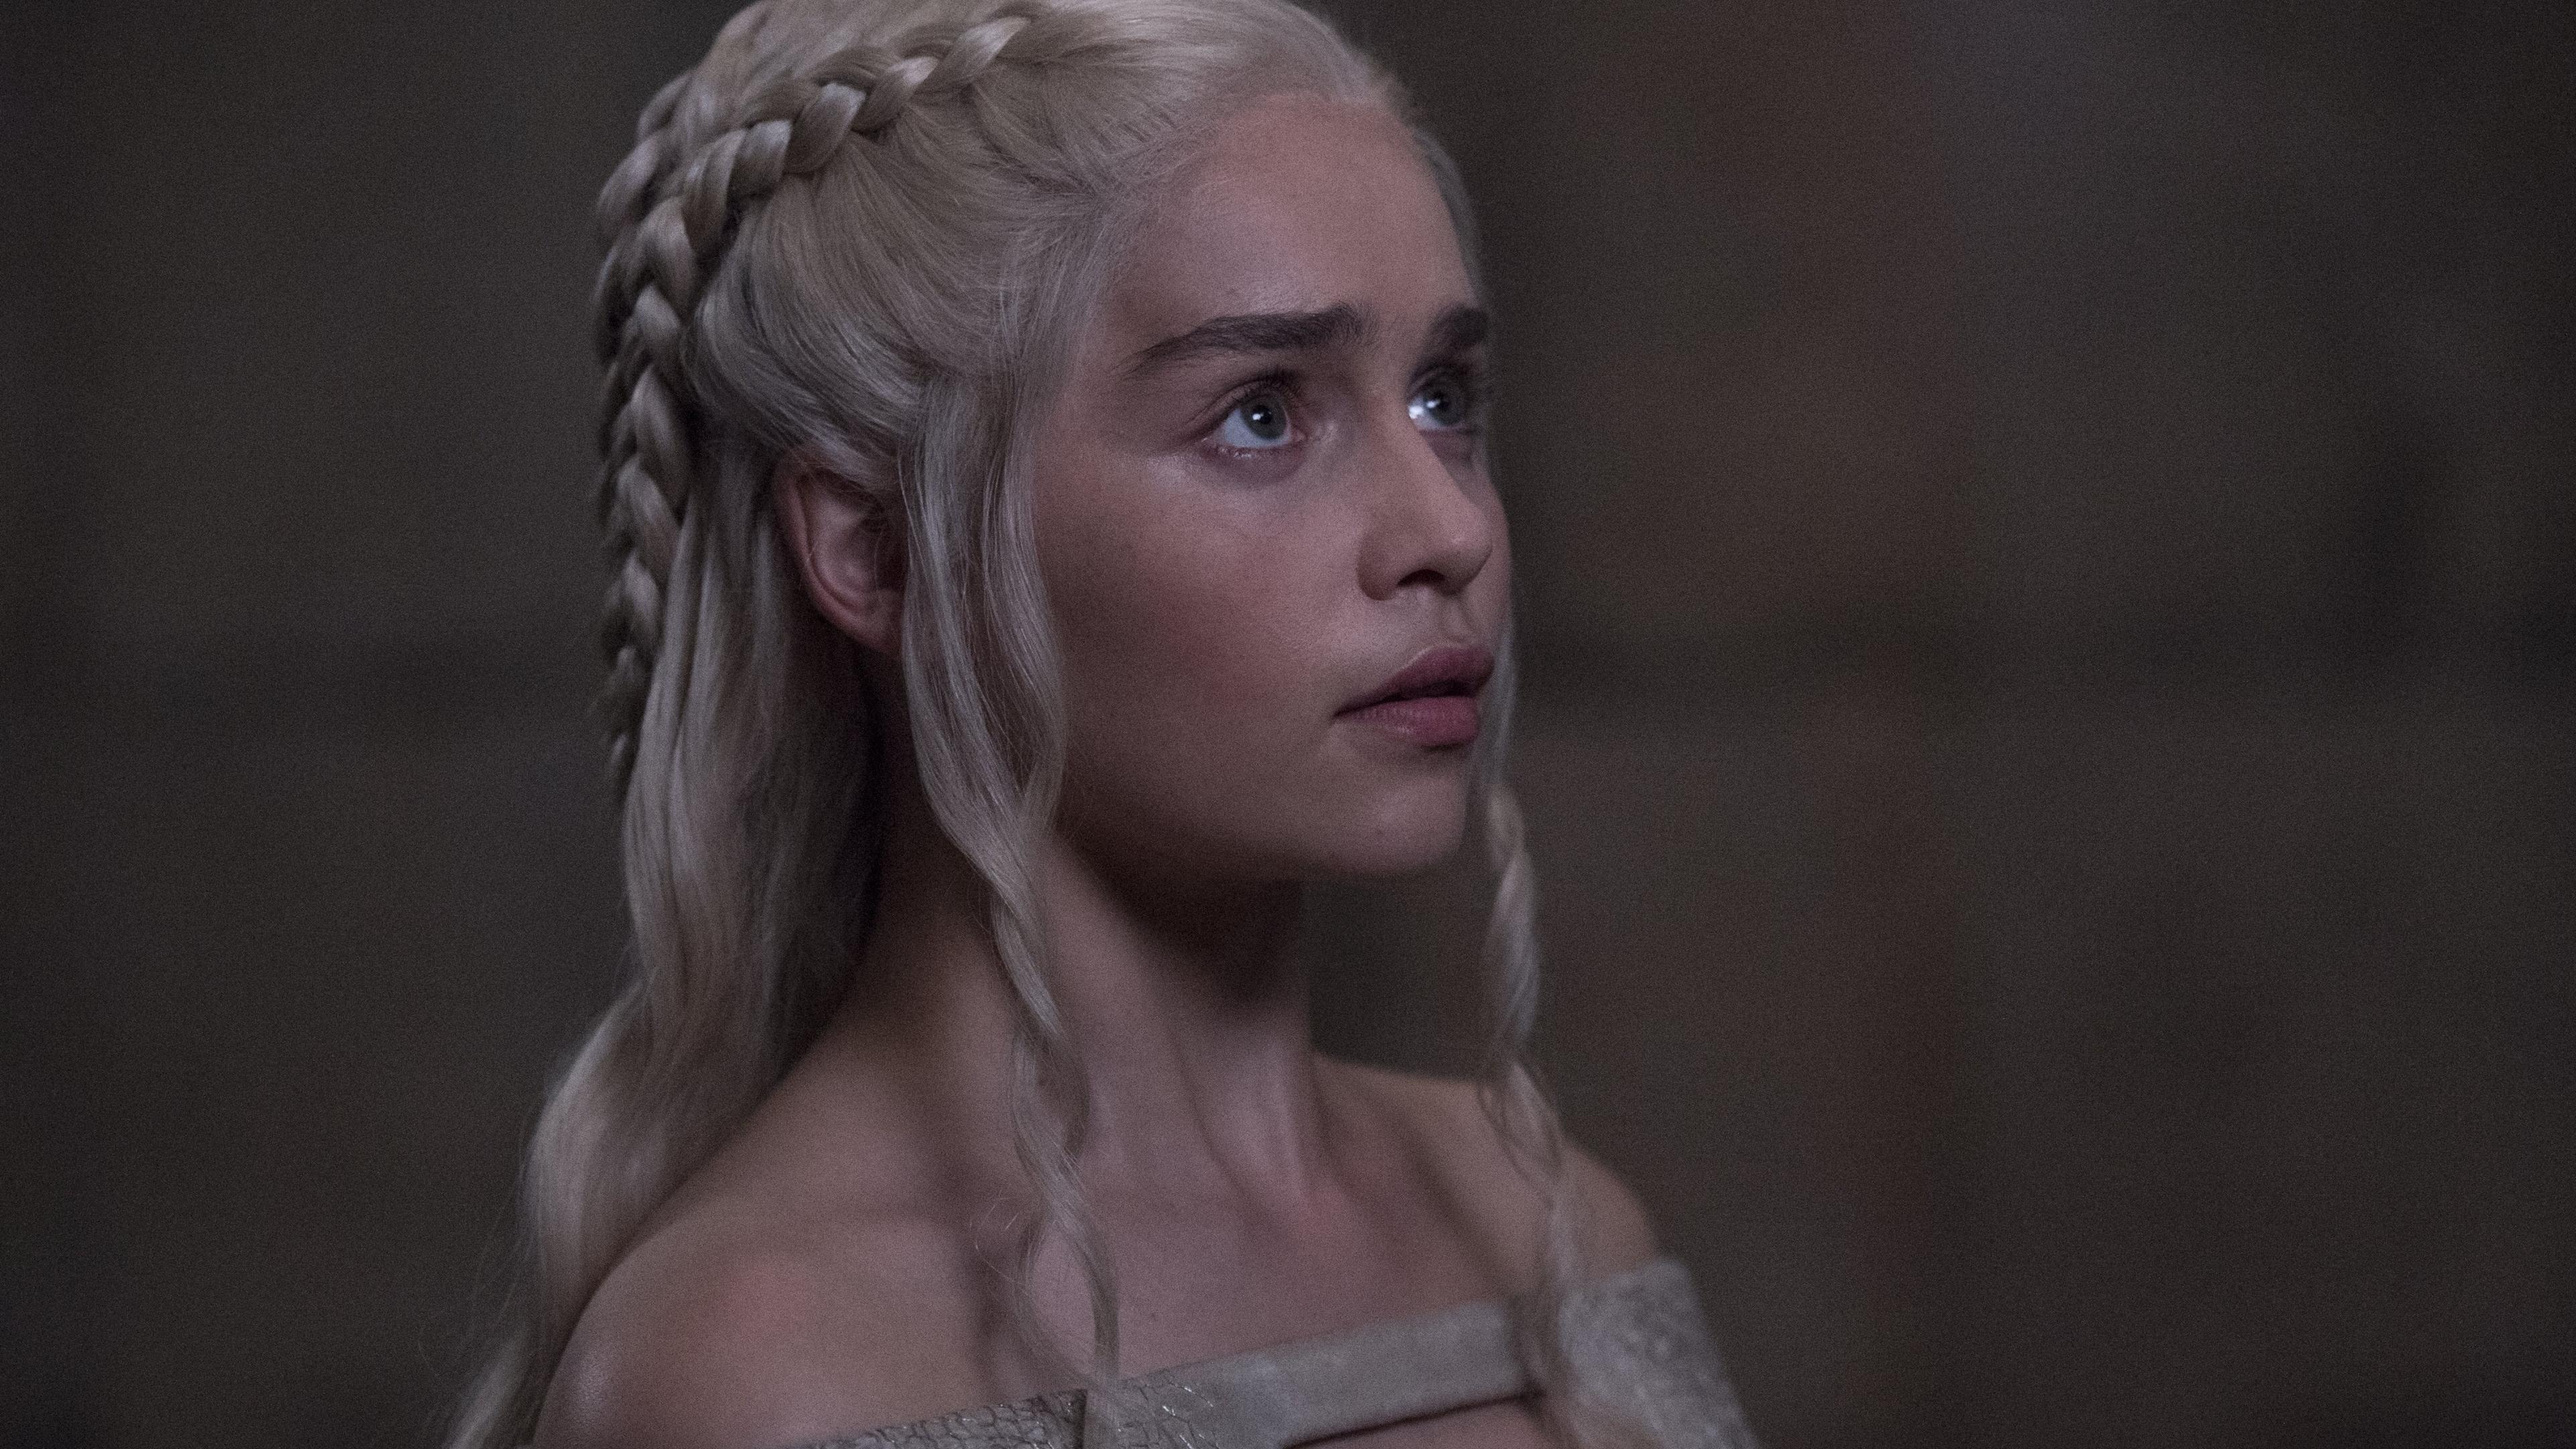 Download 3840x2160 Wallpaper Curious Daenerys Targaryen